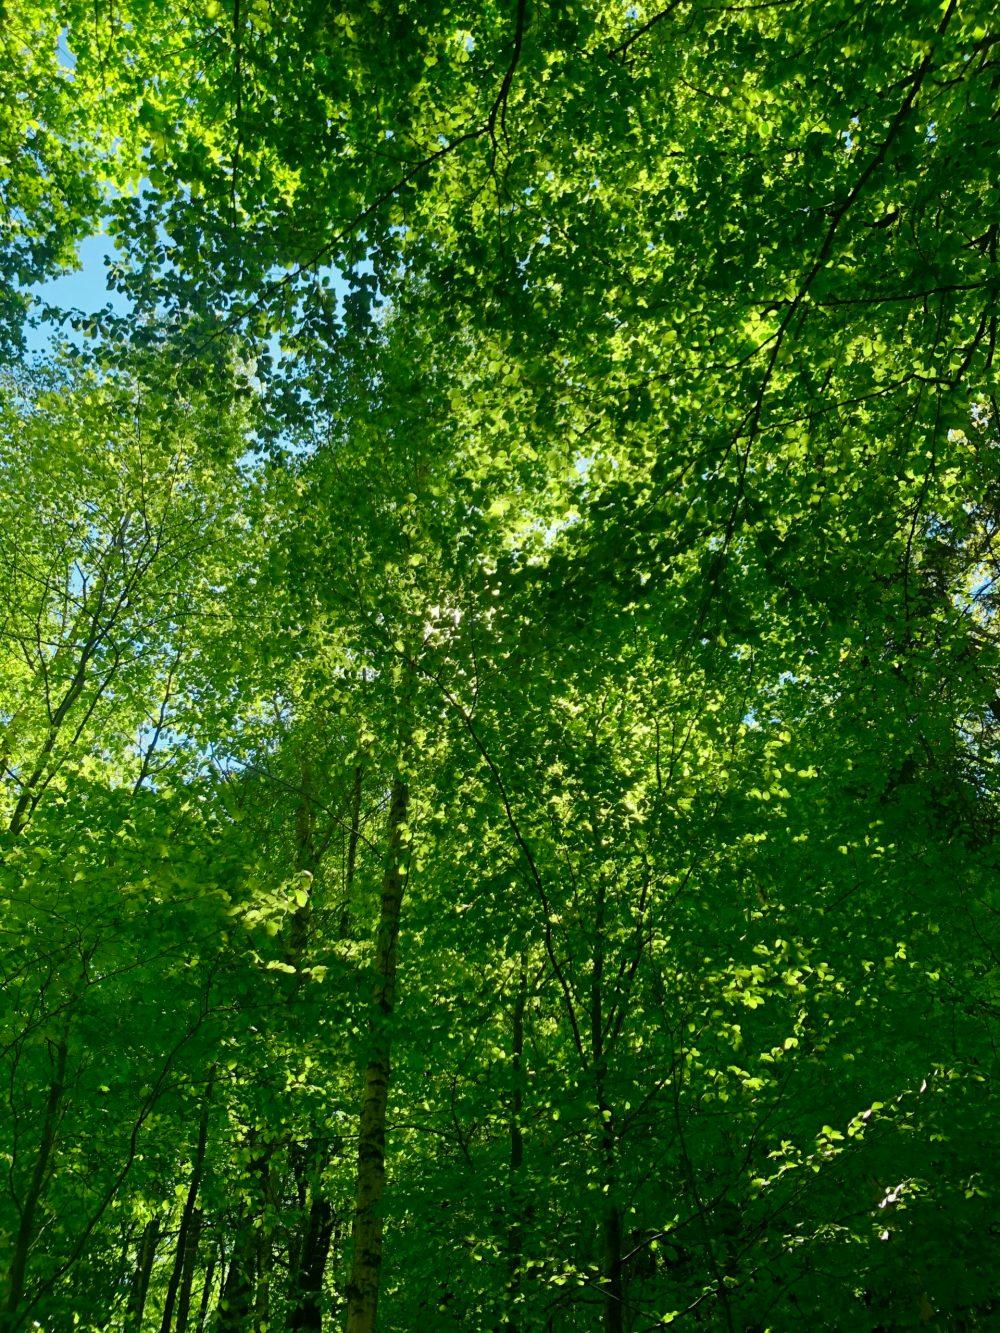 Grüne Atmosphäre im Wald